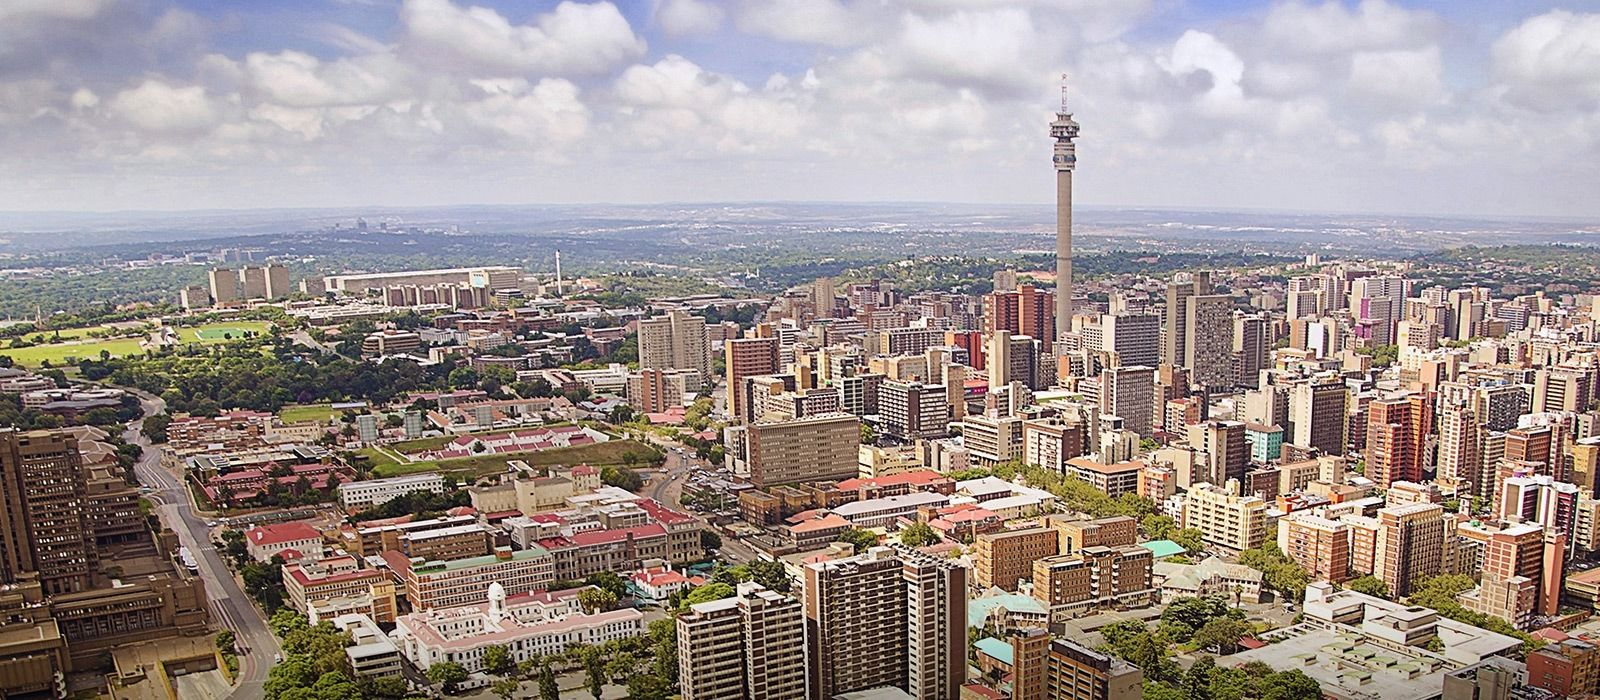 Victoria Falls and Botswana Highlights Tour Trip 1